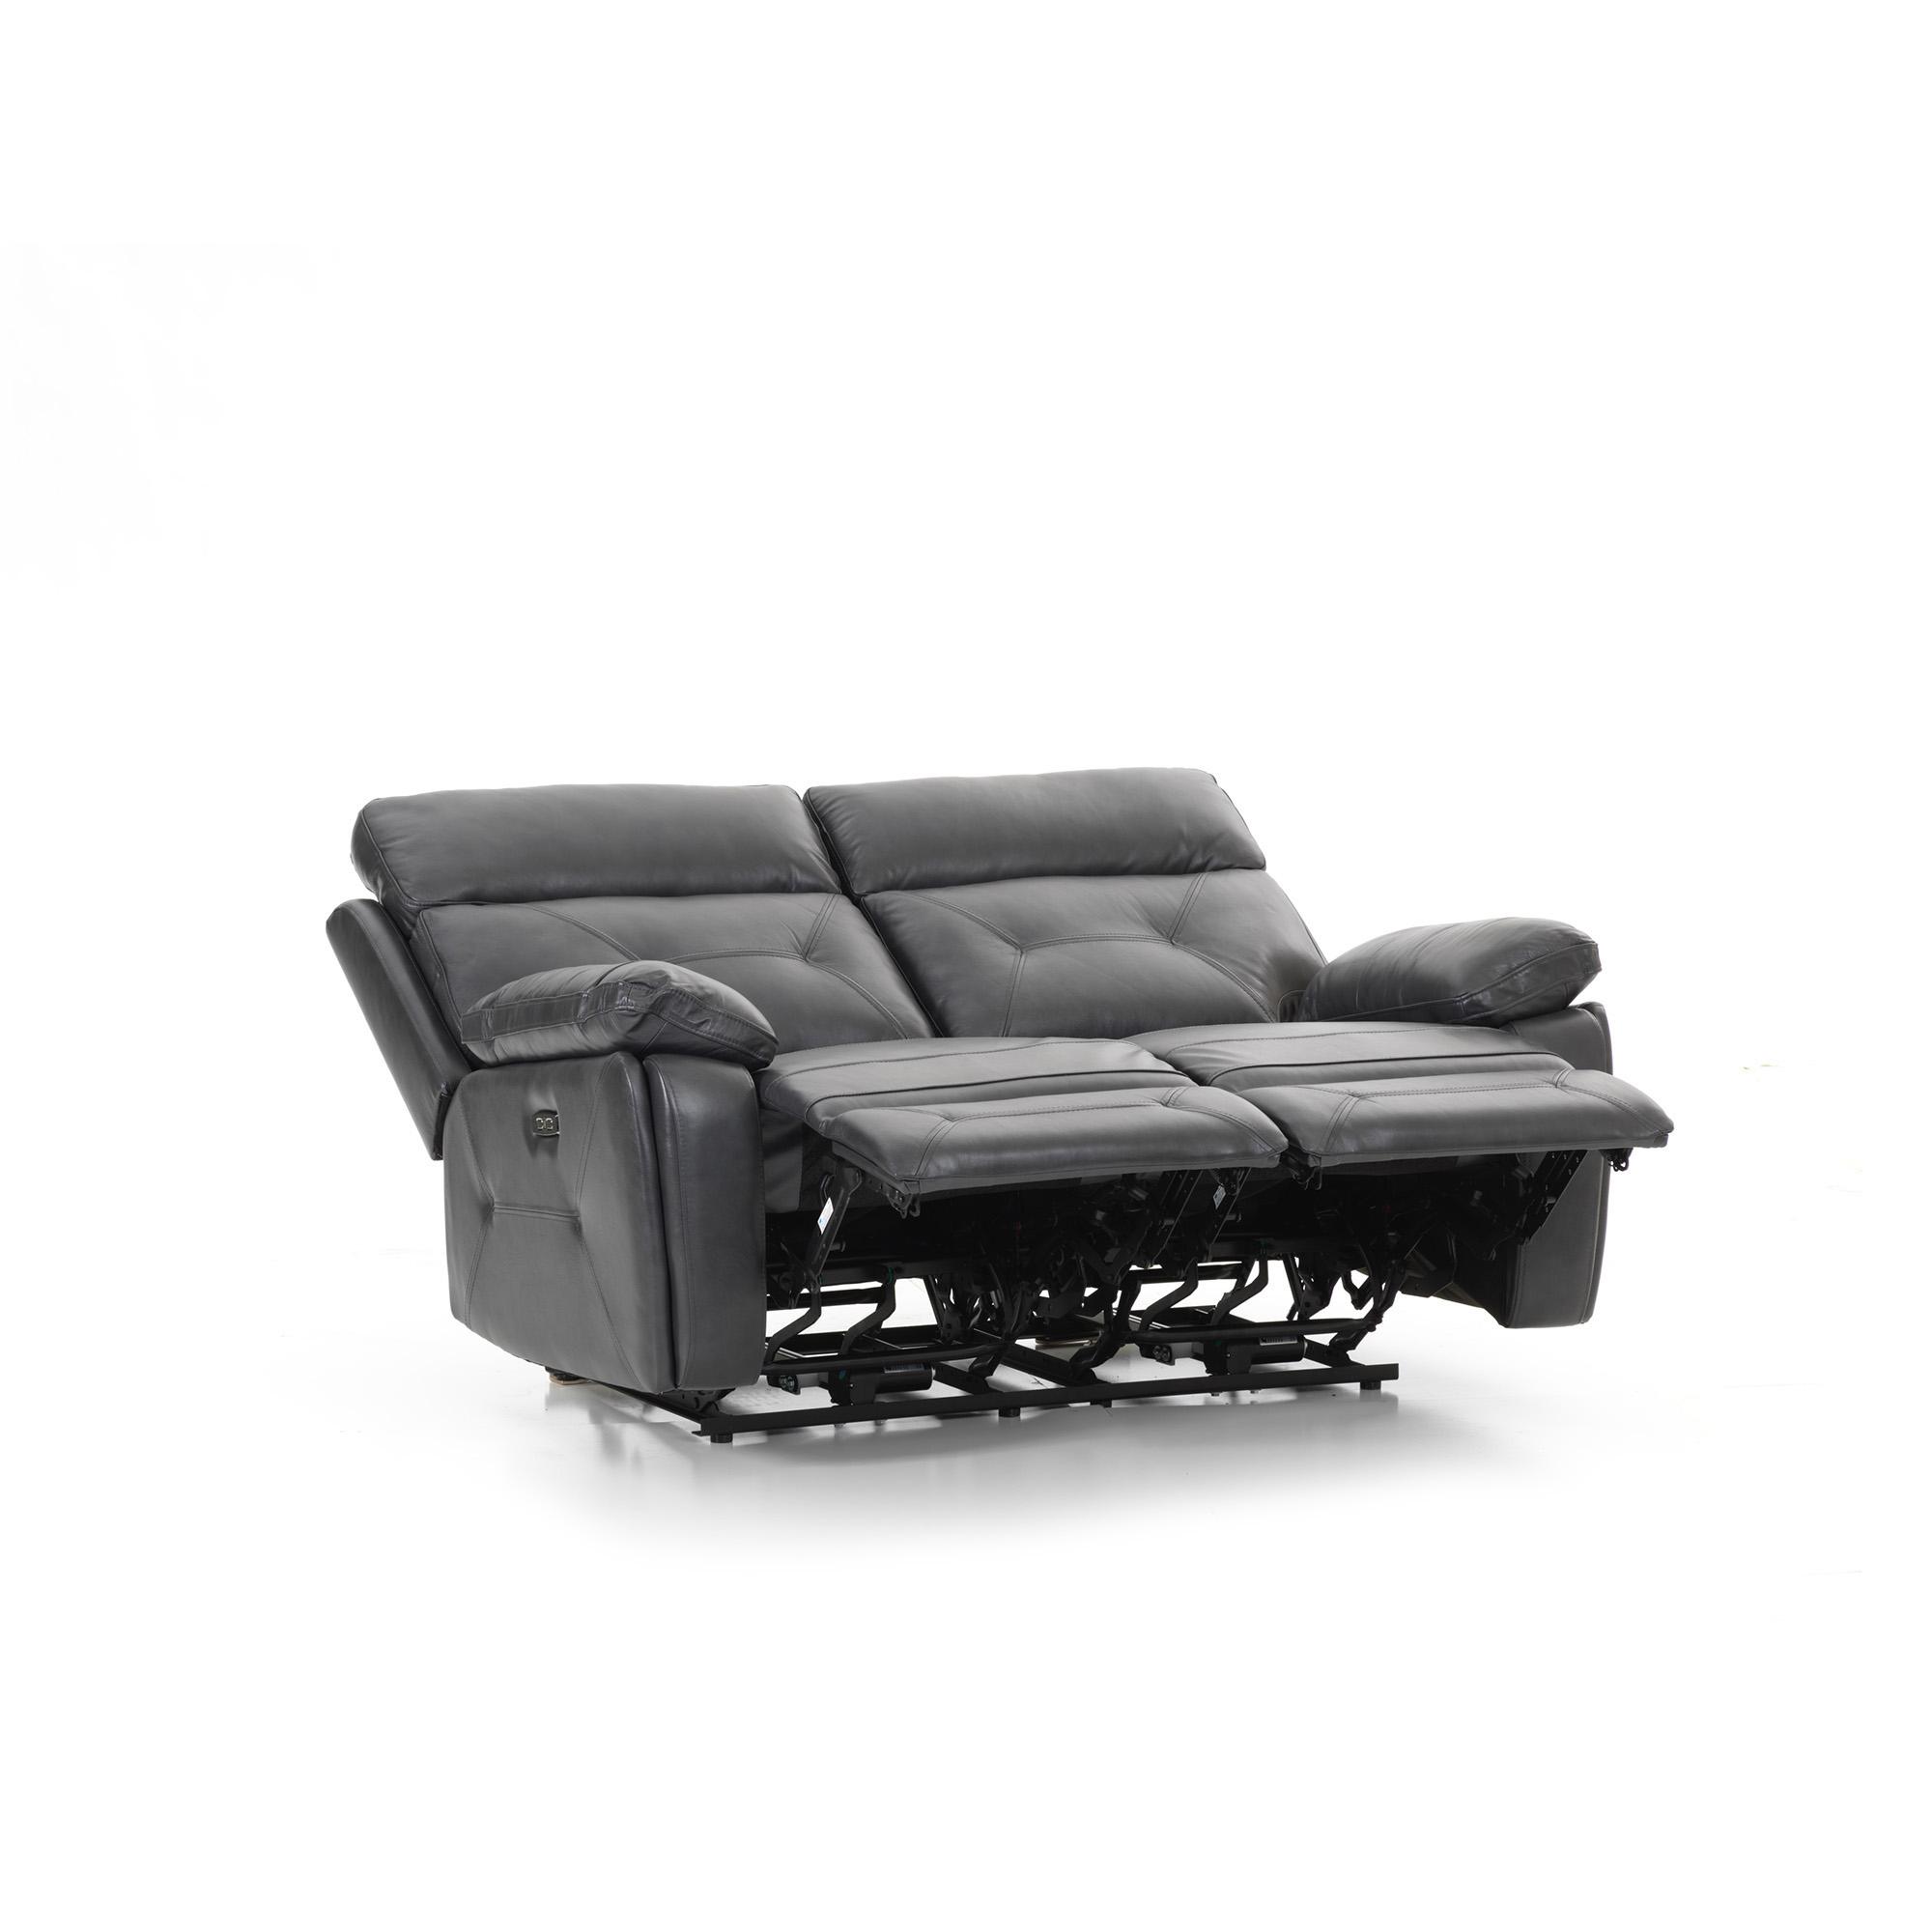 Capris Power Reclining Loveseat Intercon Furniture